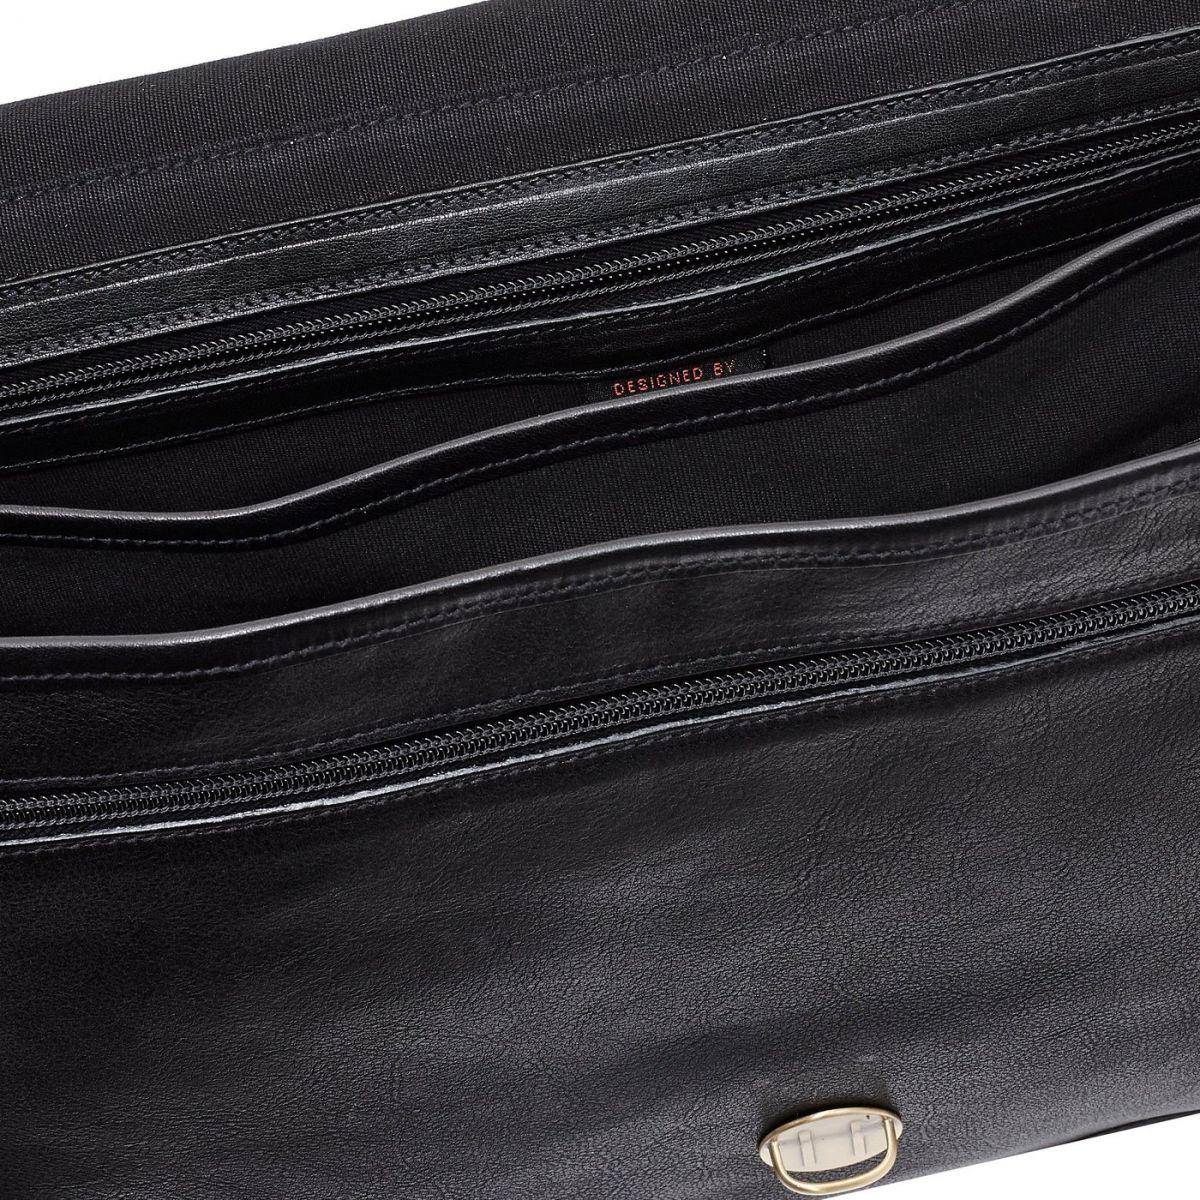 Briefcase in Vintage Cowhide Leather BBC014 color Black | Details